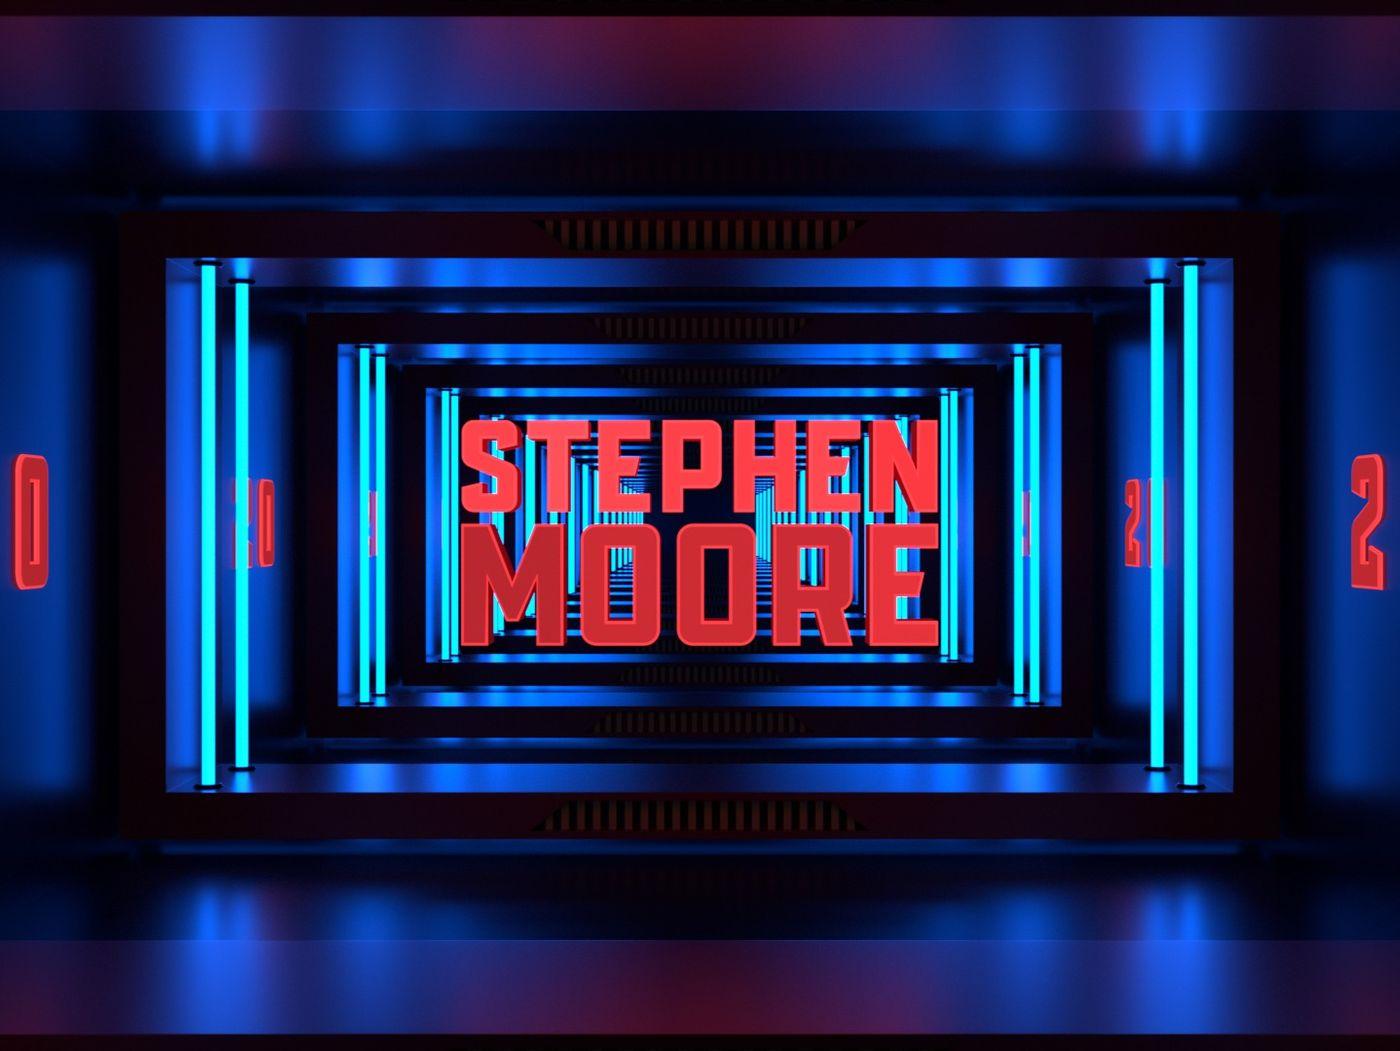 StephenMooreMotion 2020 - 3D Motion Graphics